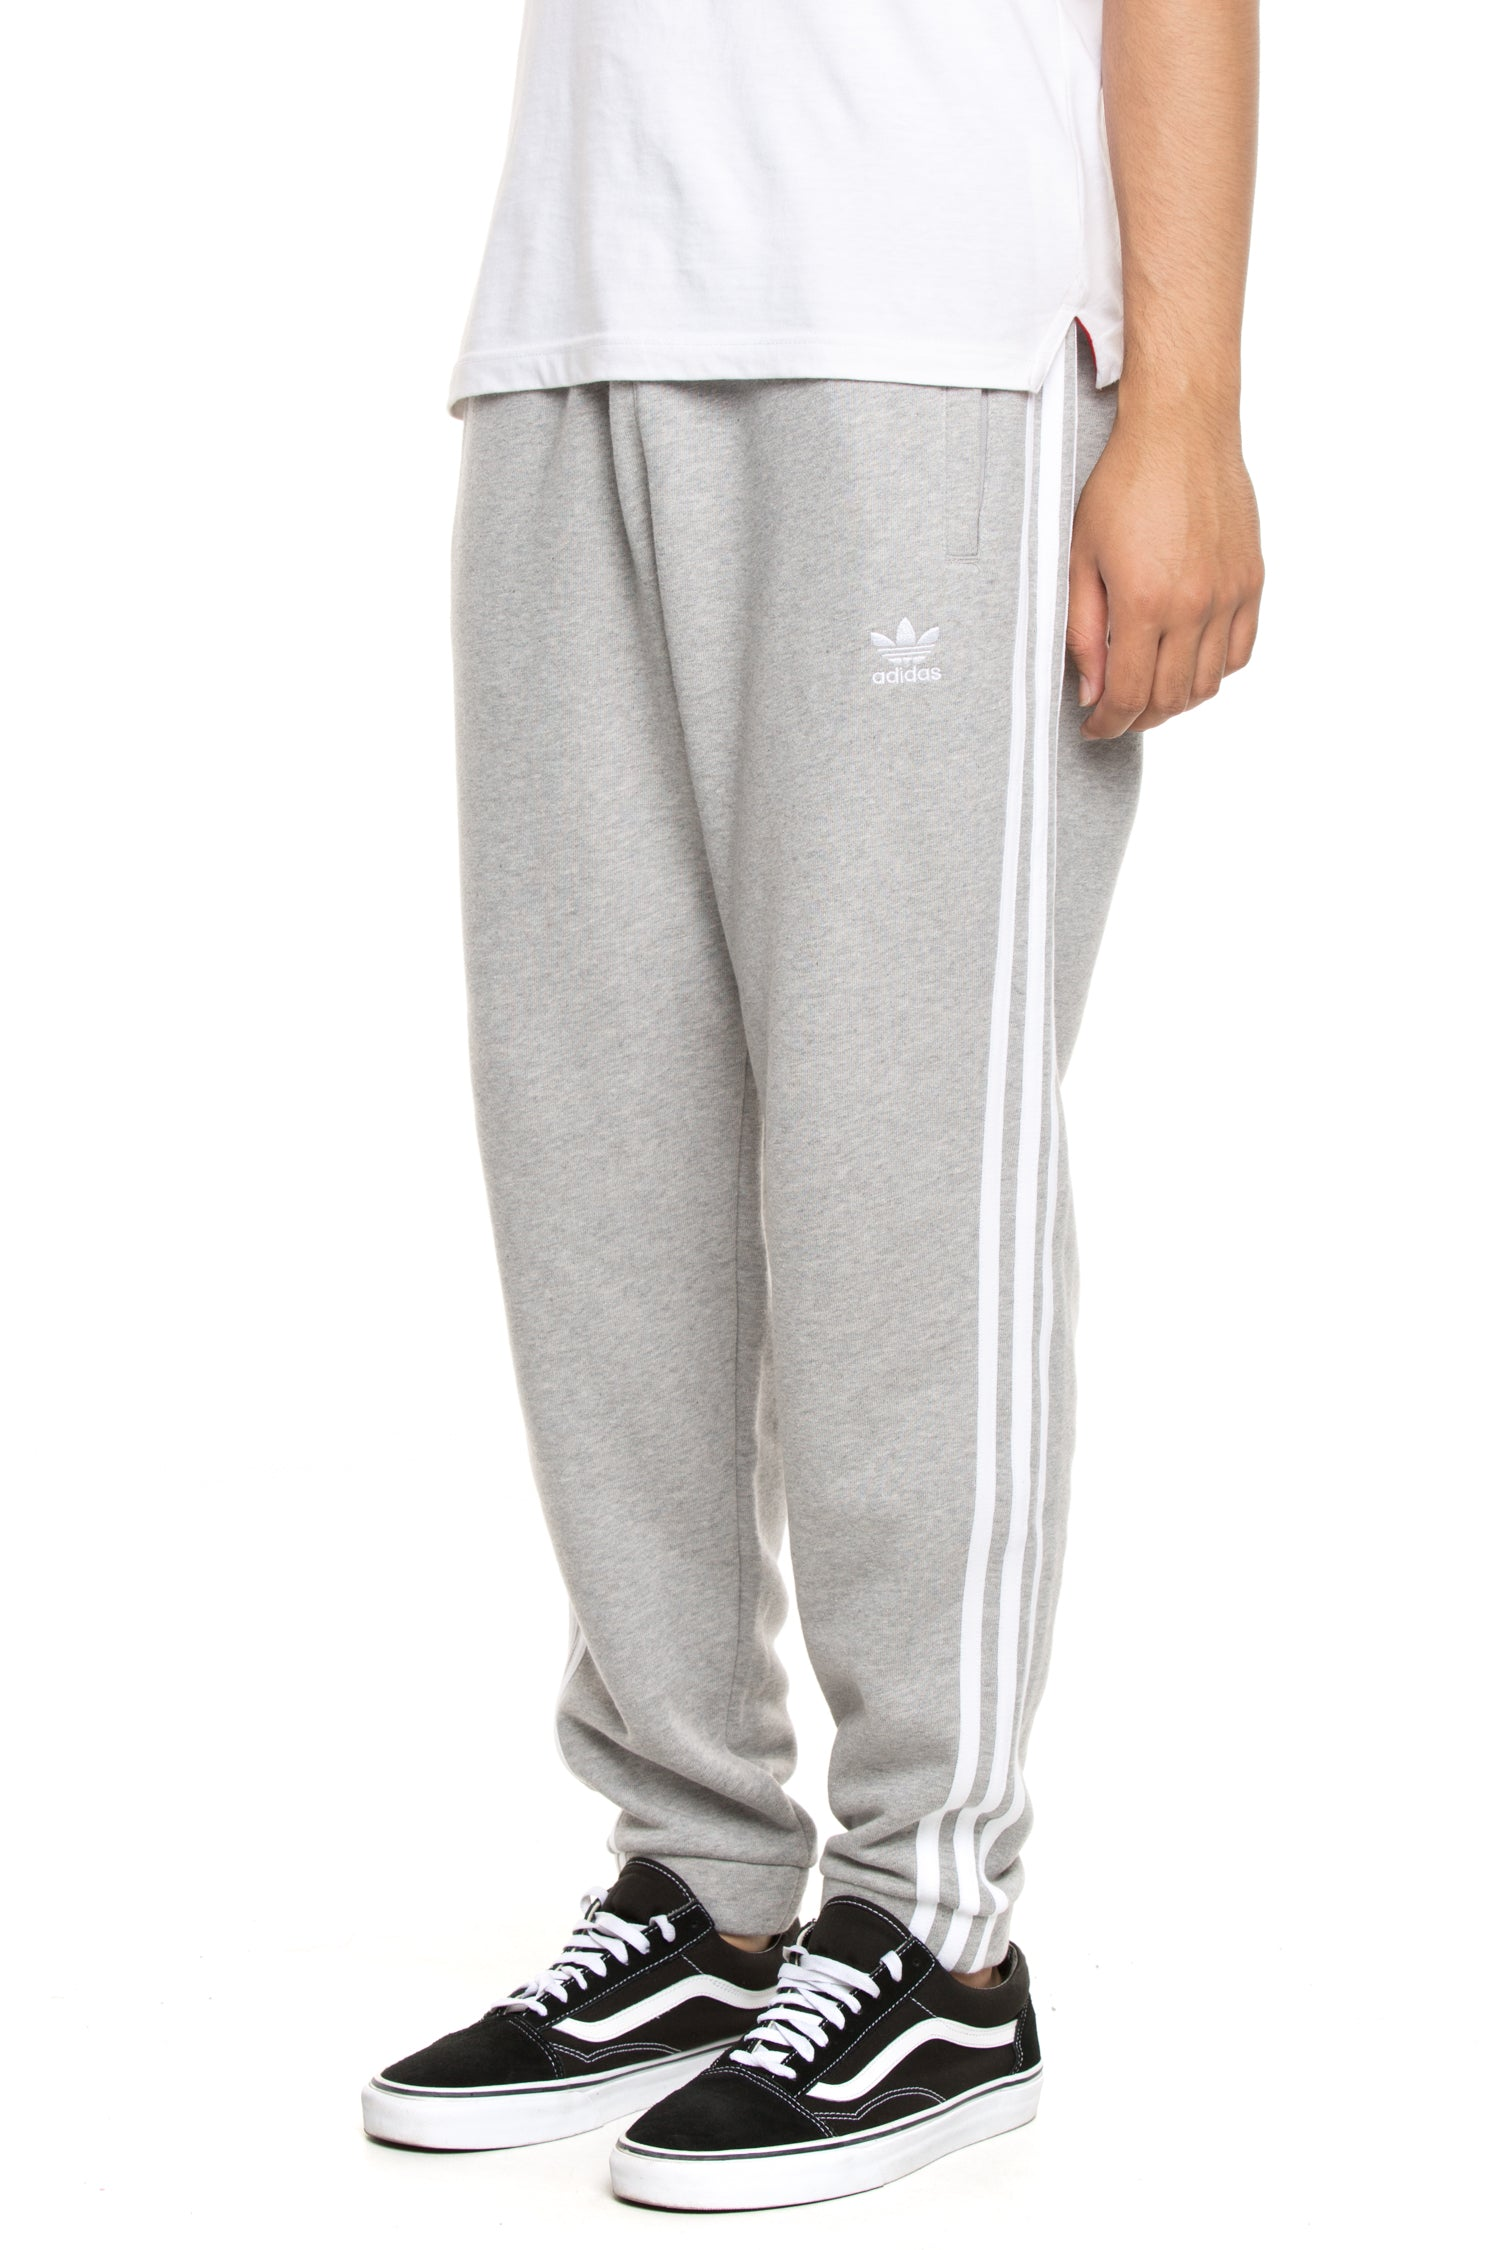 Adidas 3-Stripes Slim Fit Jogger Pants  Size XL  Dark Heather Grey//Black NEW NWT